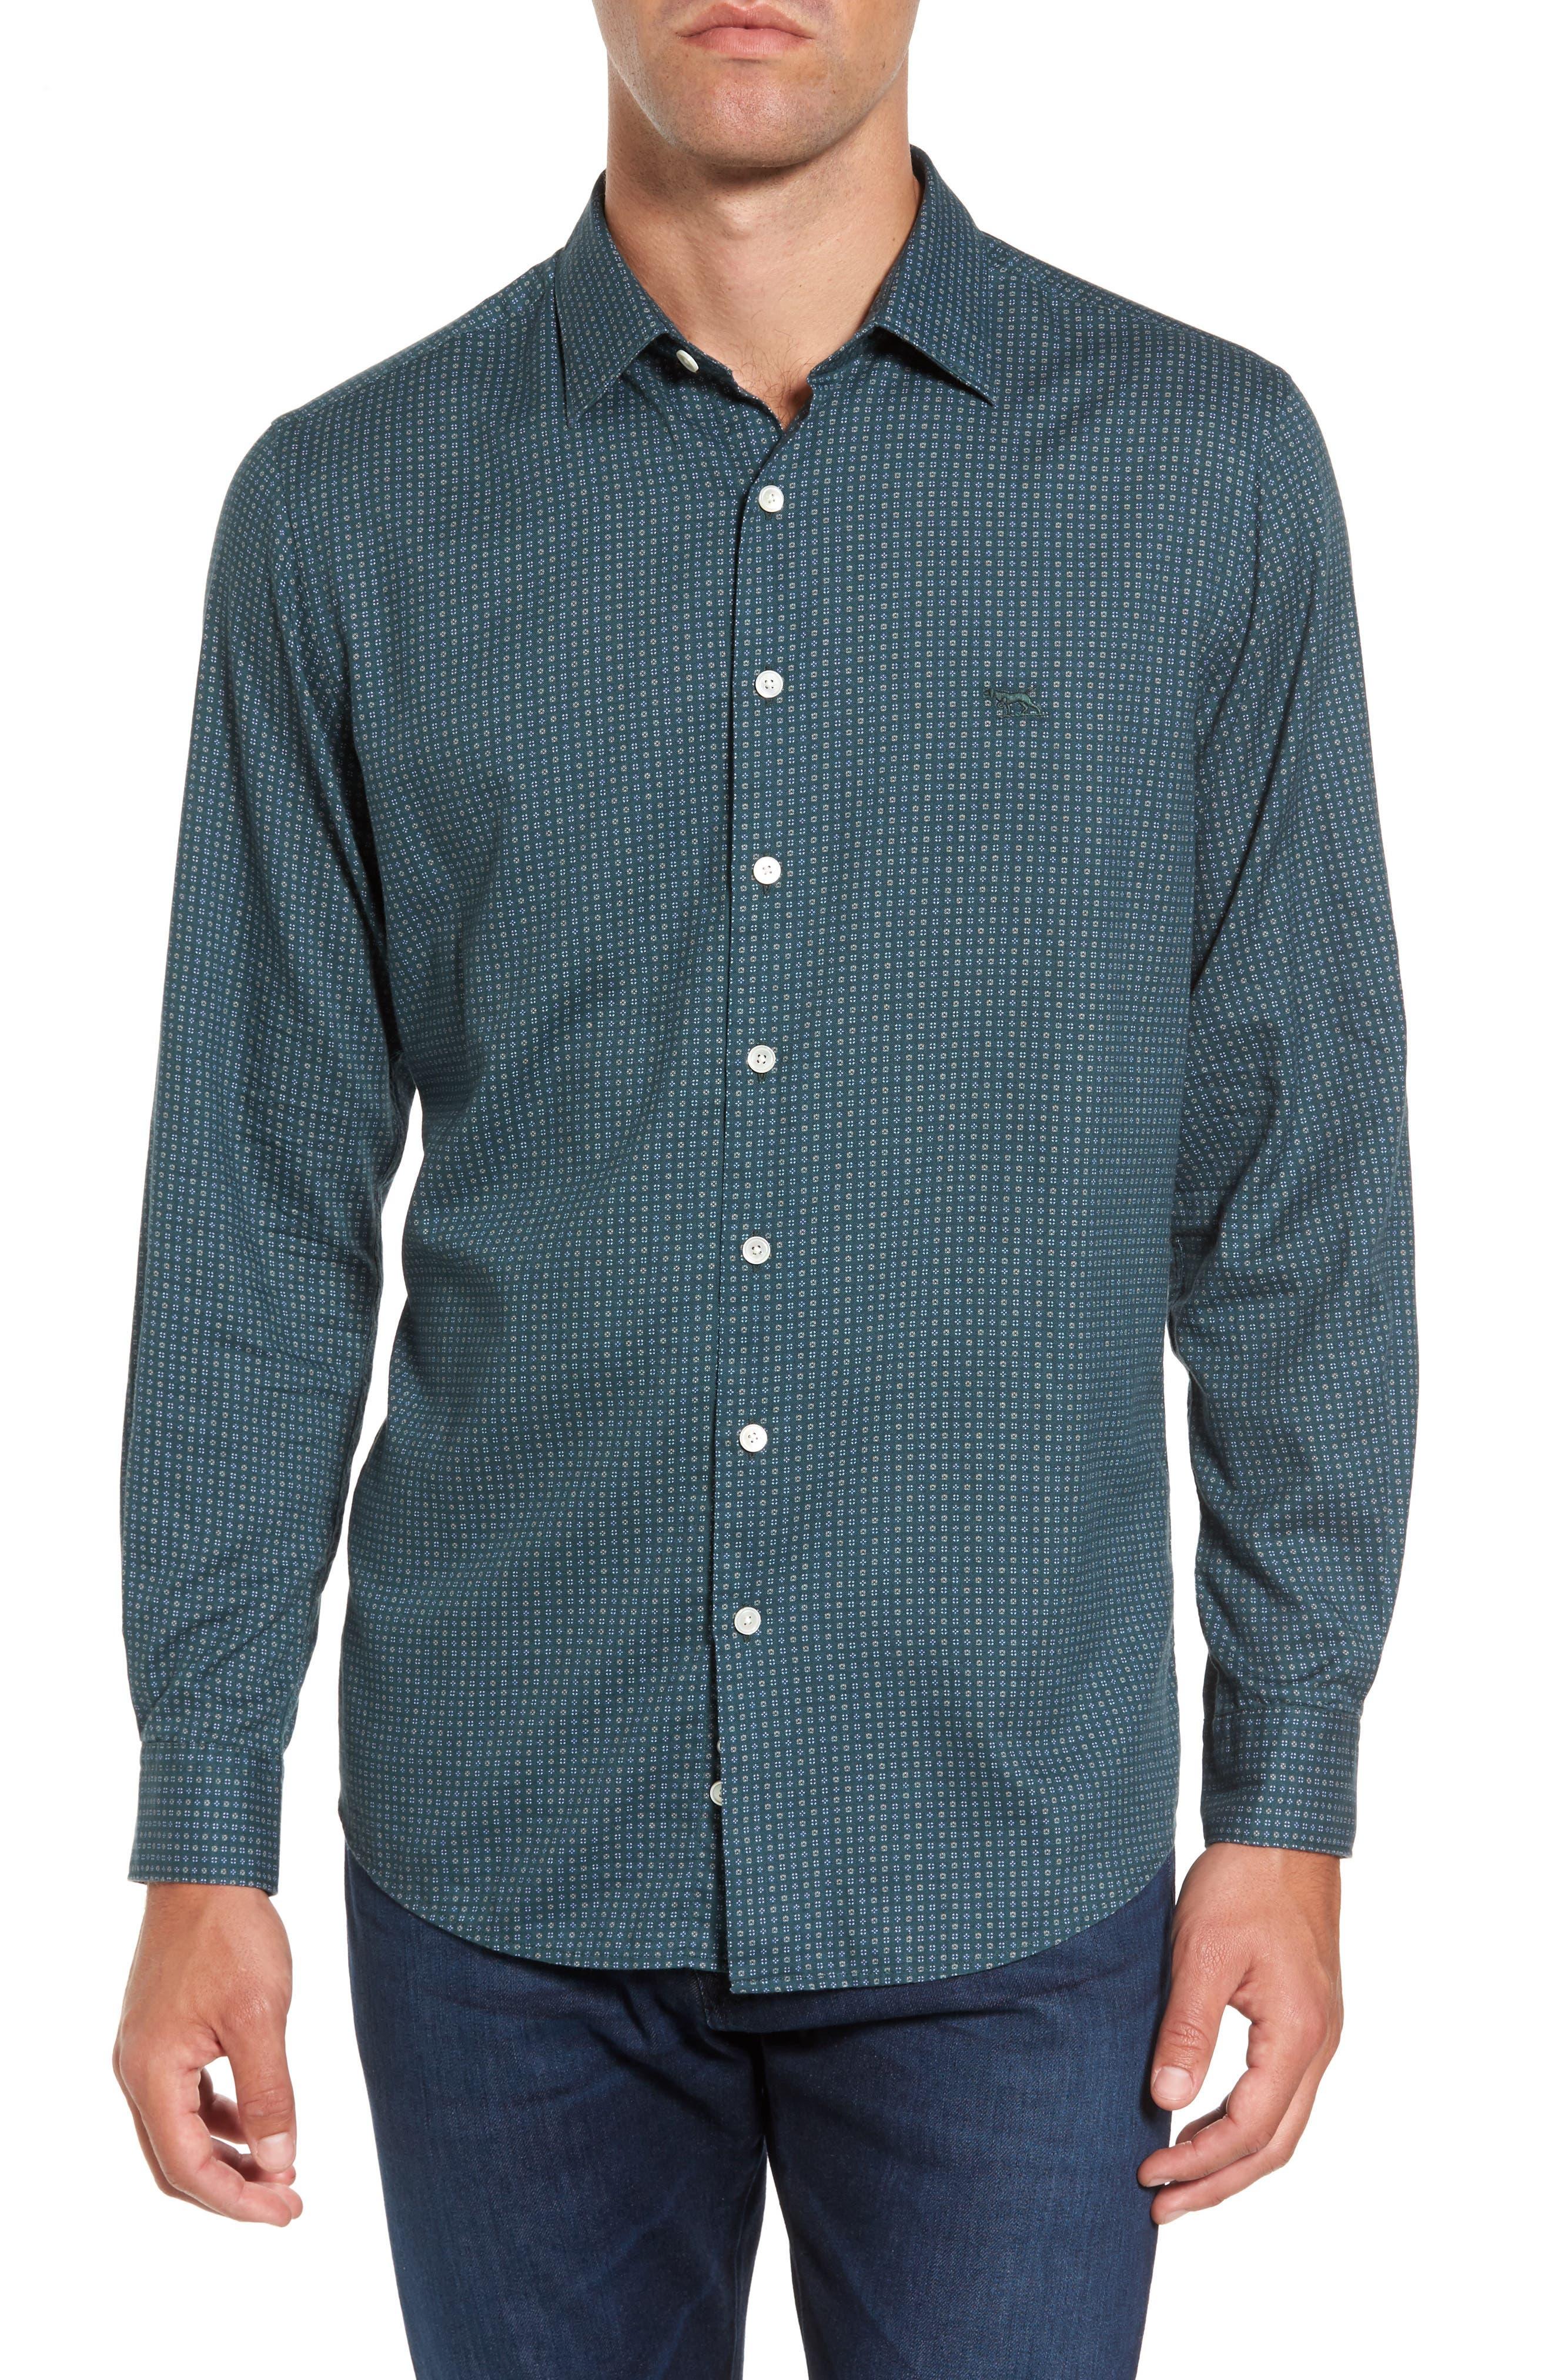 Alternate Image 1 Selected - Rodd & Gunn Oreti Beach Sports Fit Floral Print Sport Shirt